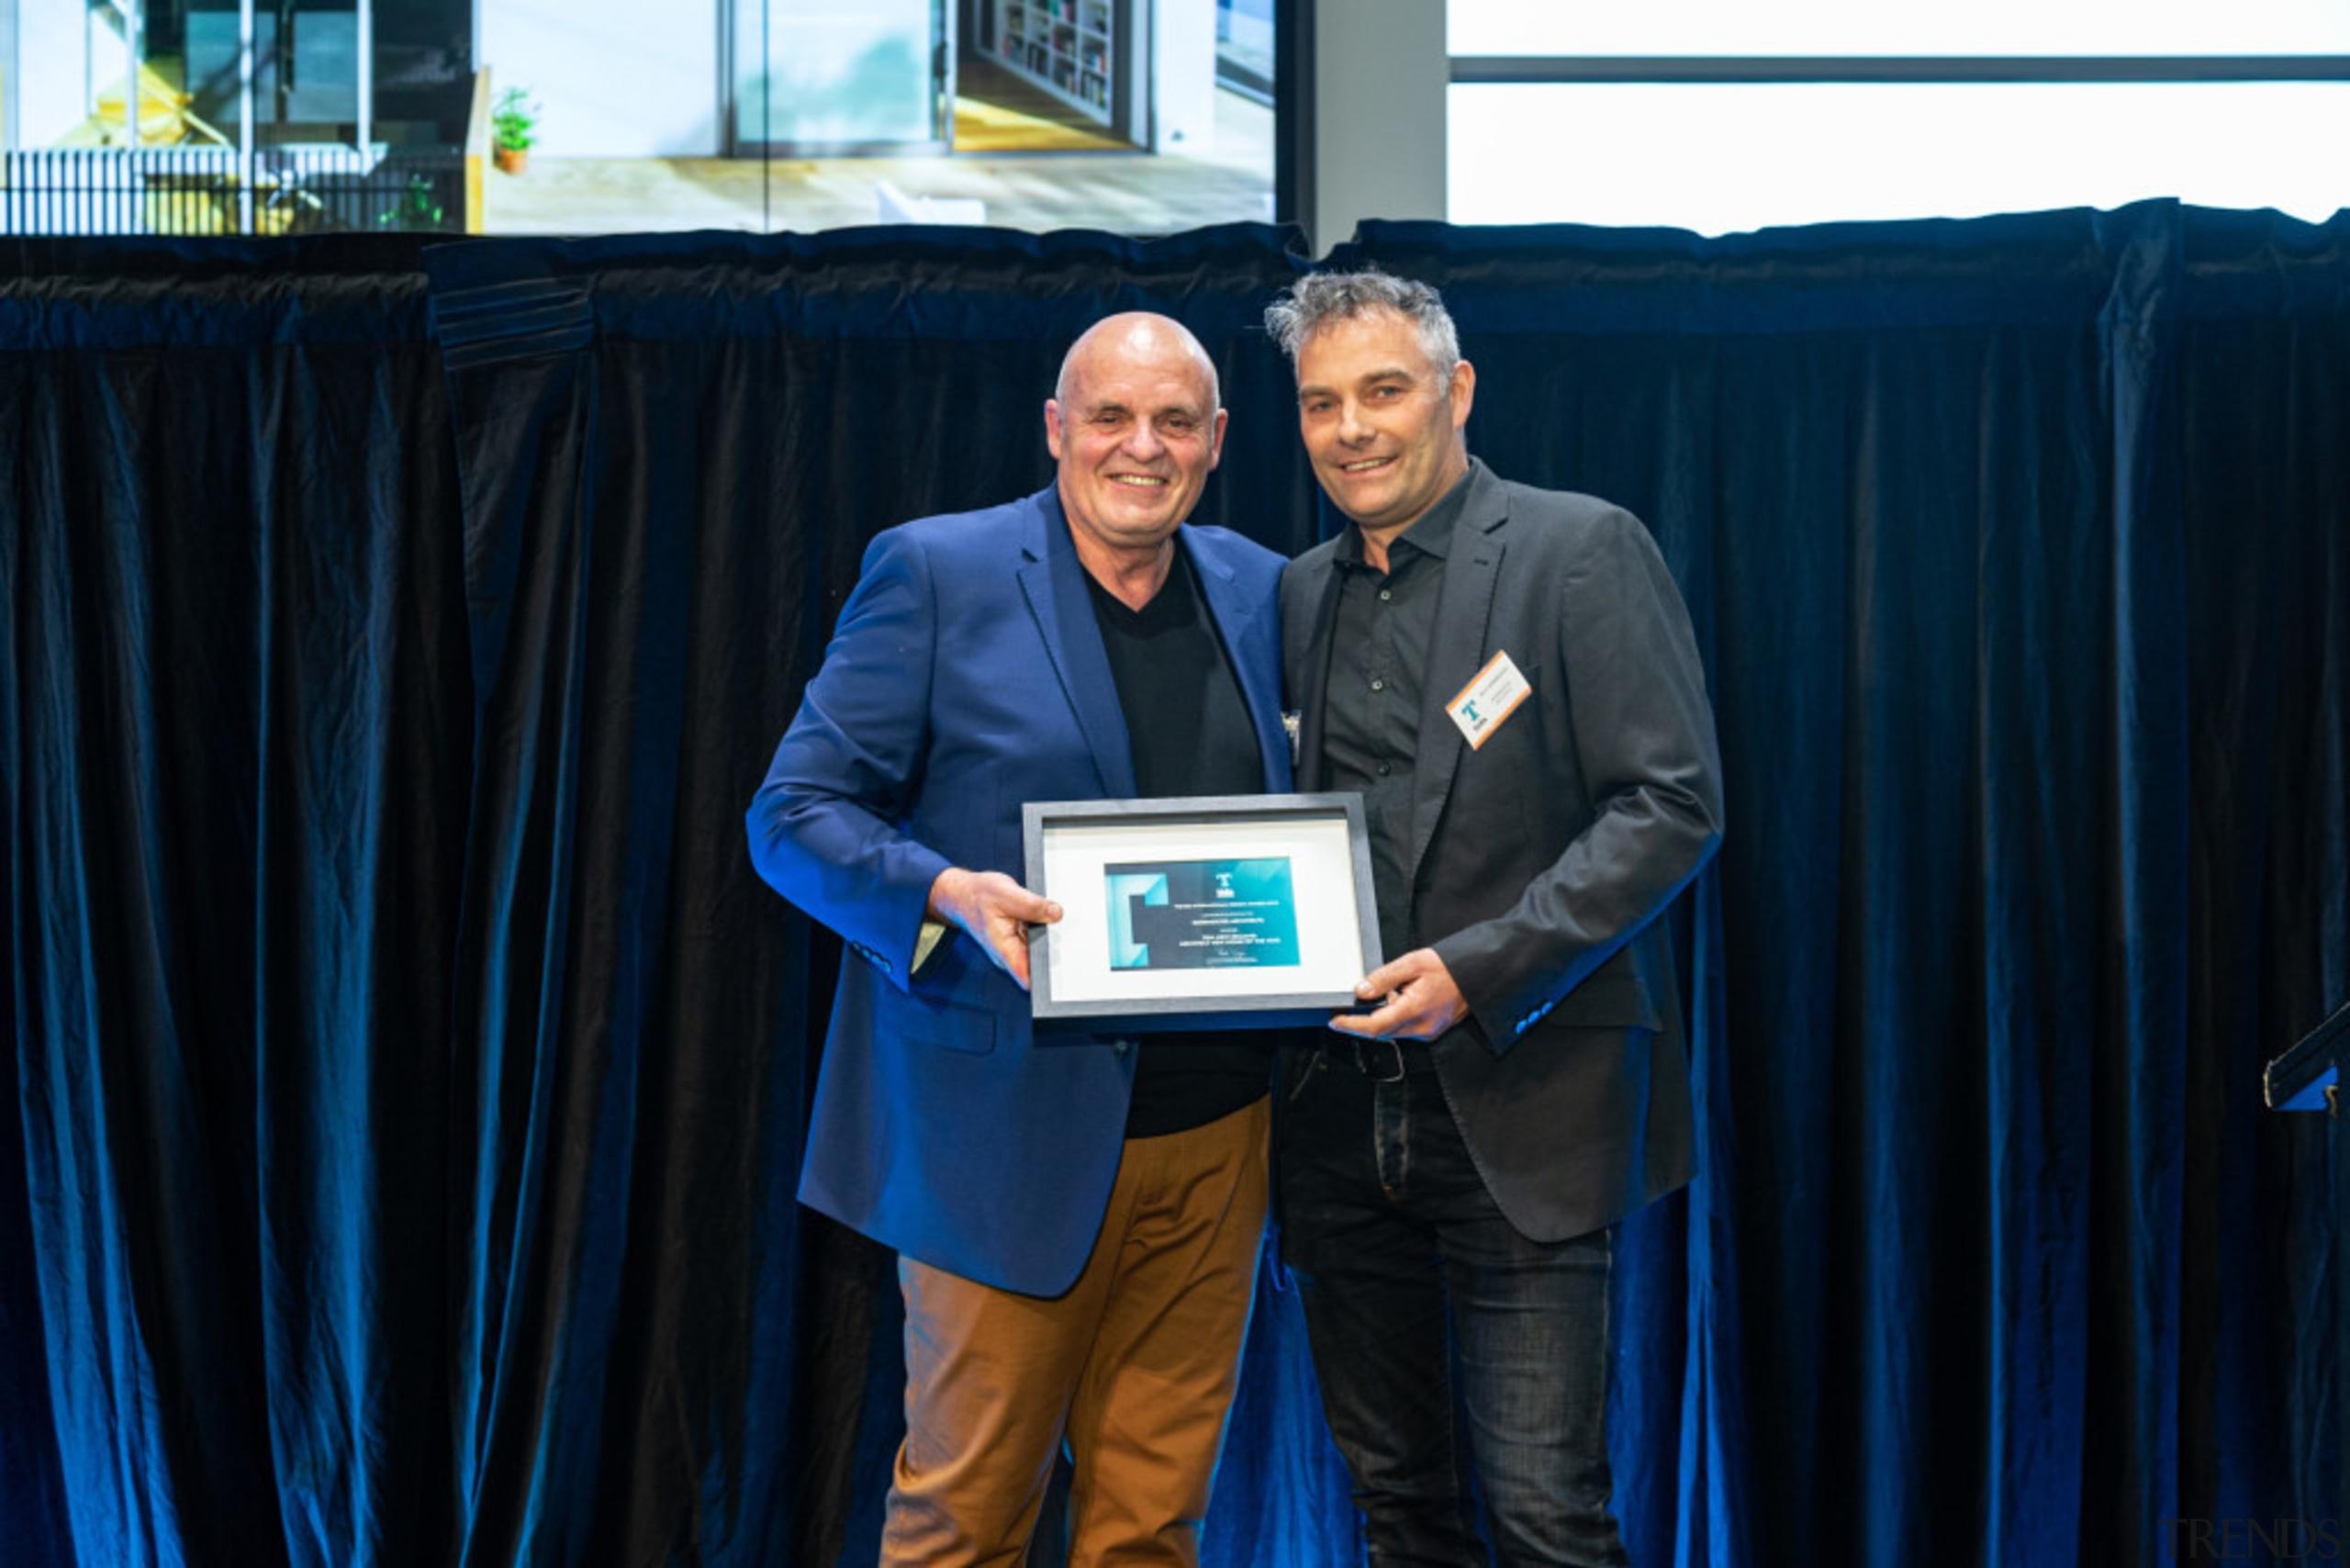 2019 TIDA New Zealand Homes presentation evening award, award ceremony, blue, electronic device, employment, event, technology, blue, black